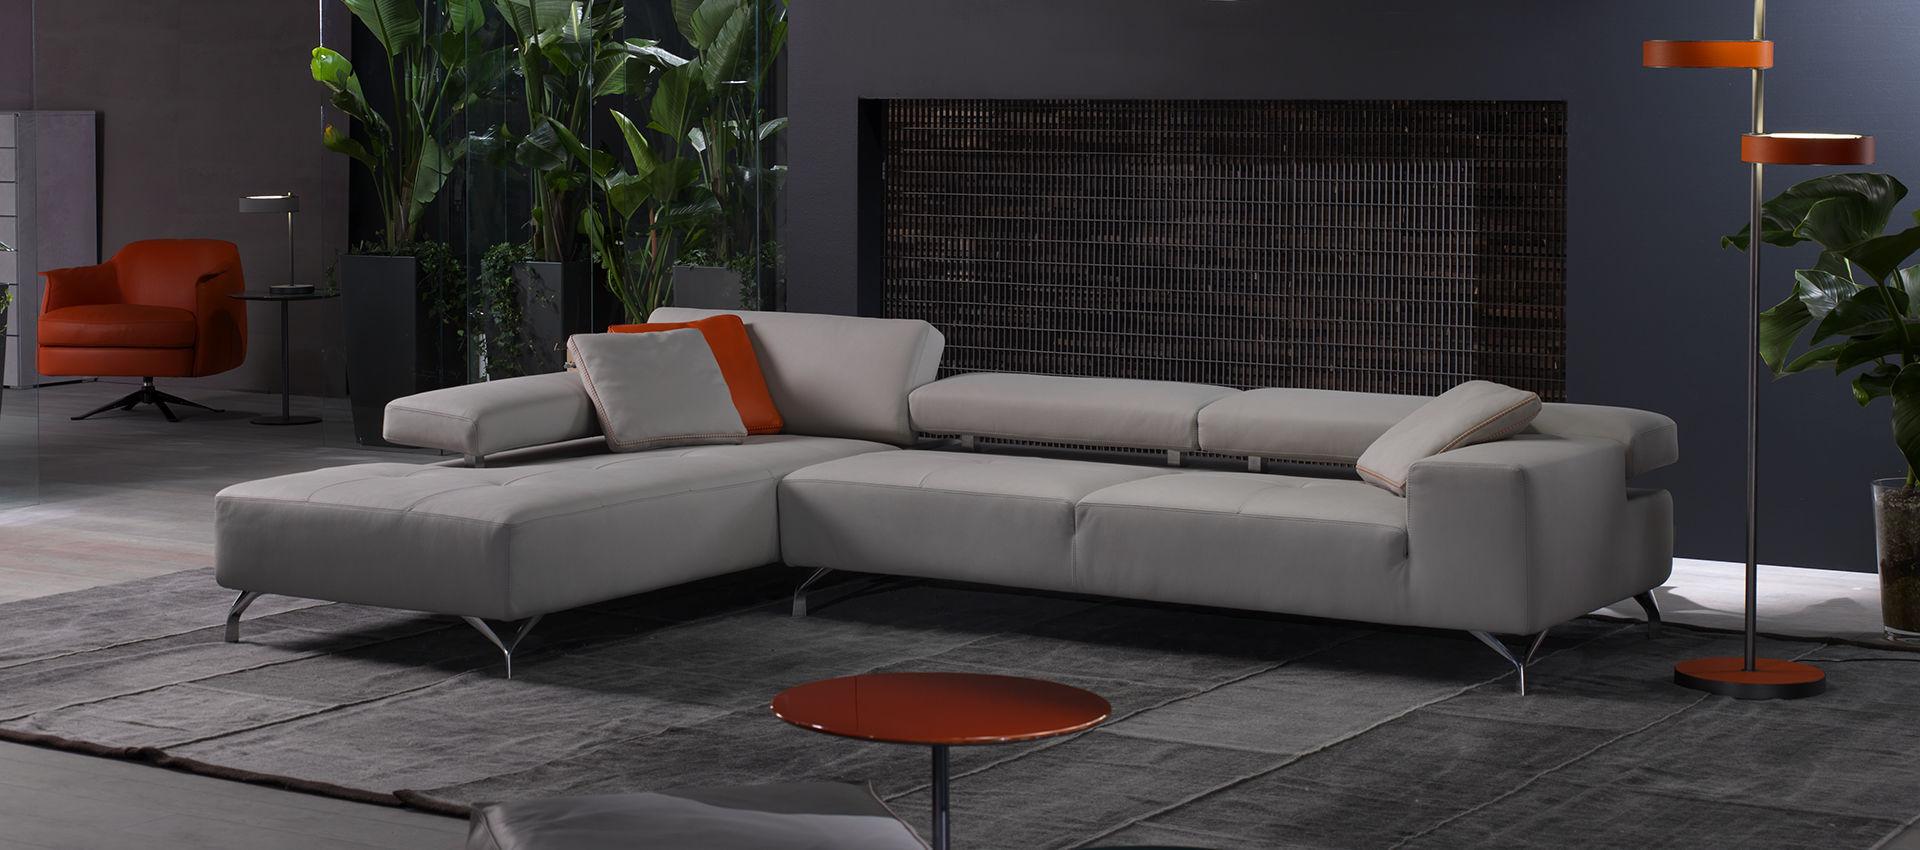 Modular sofa / contemporary / leather / reclining - MIAMI by Studio ...